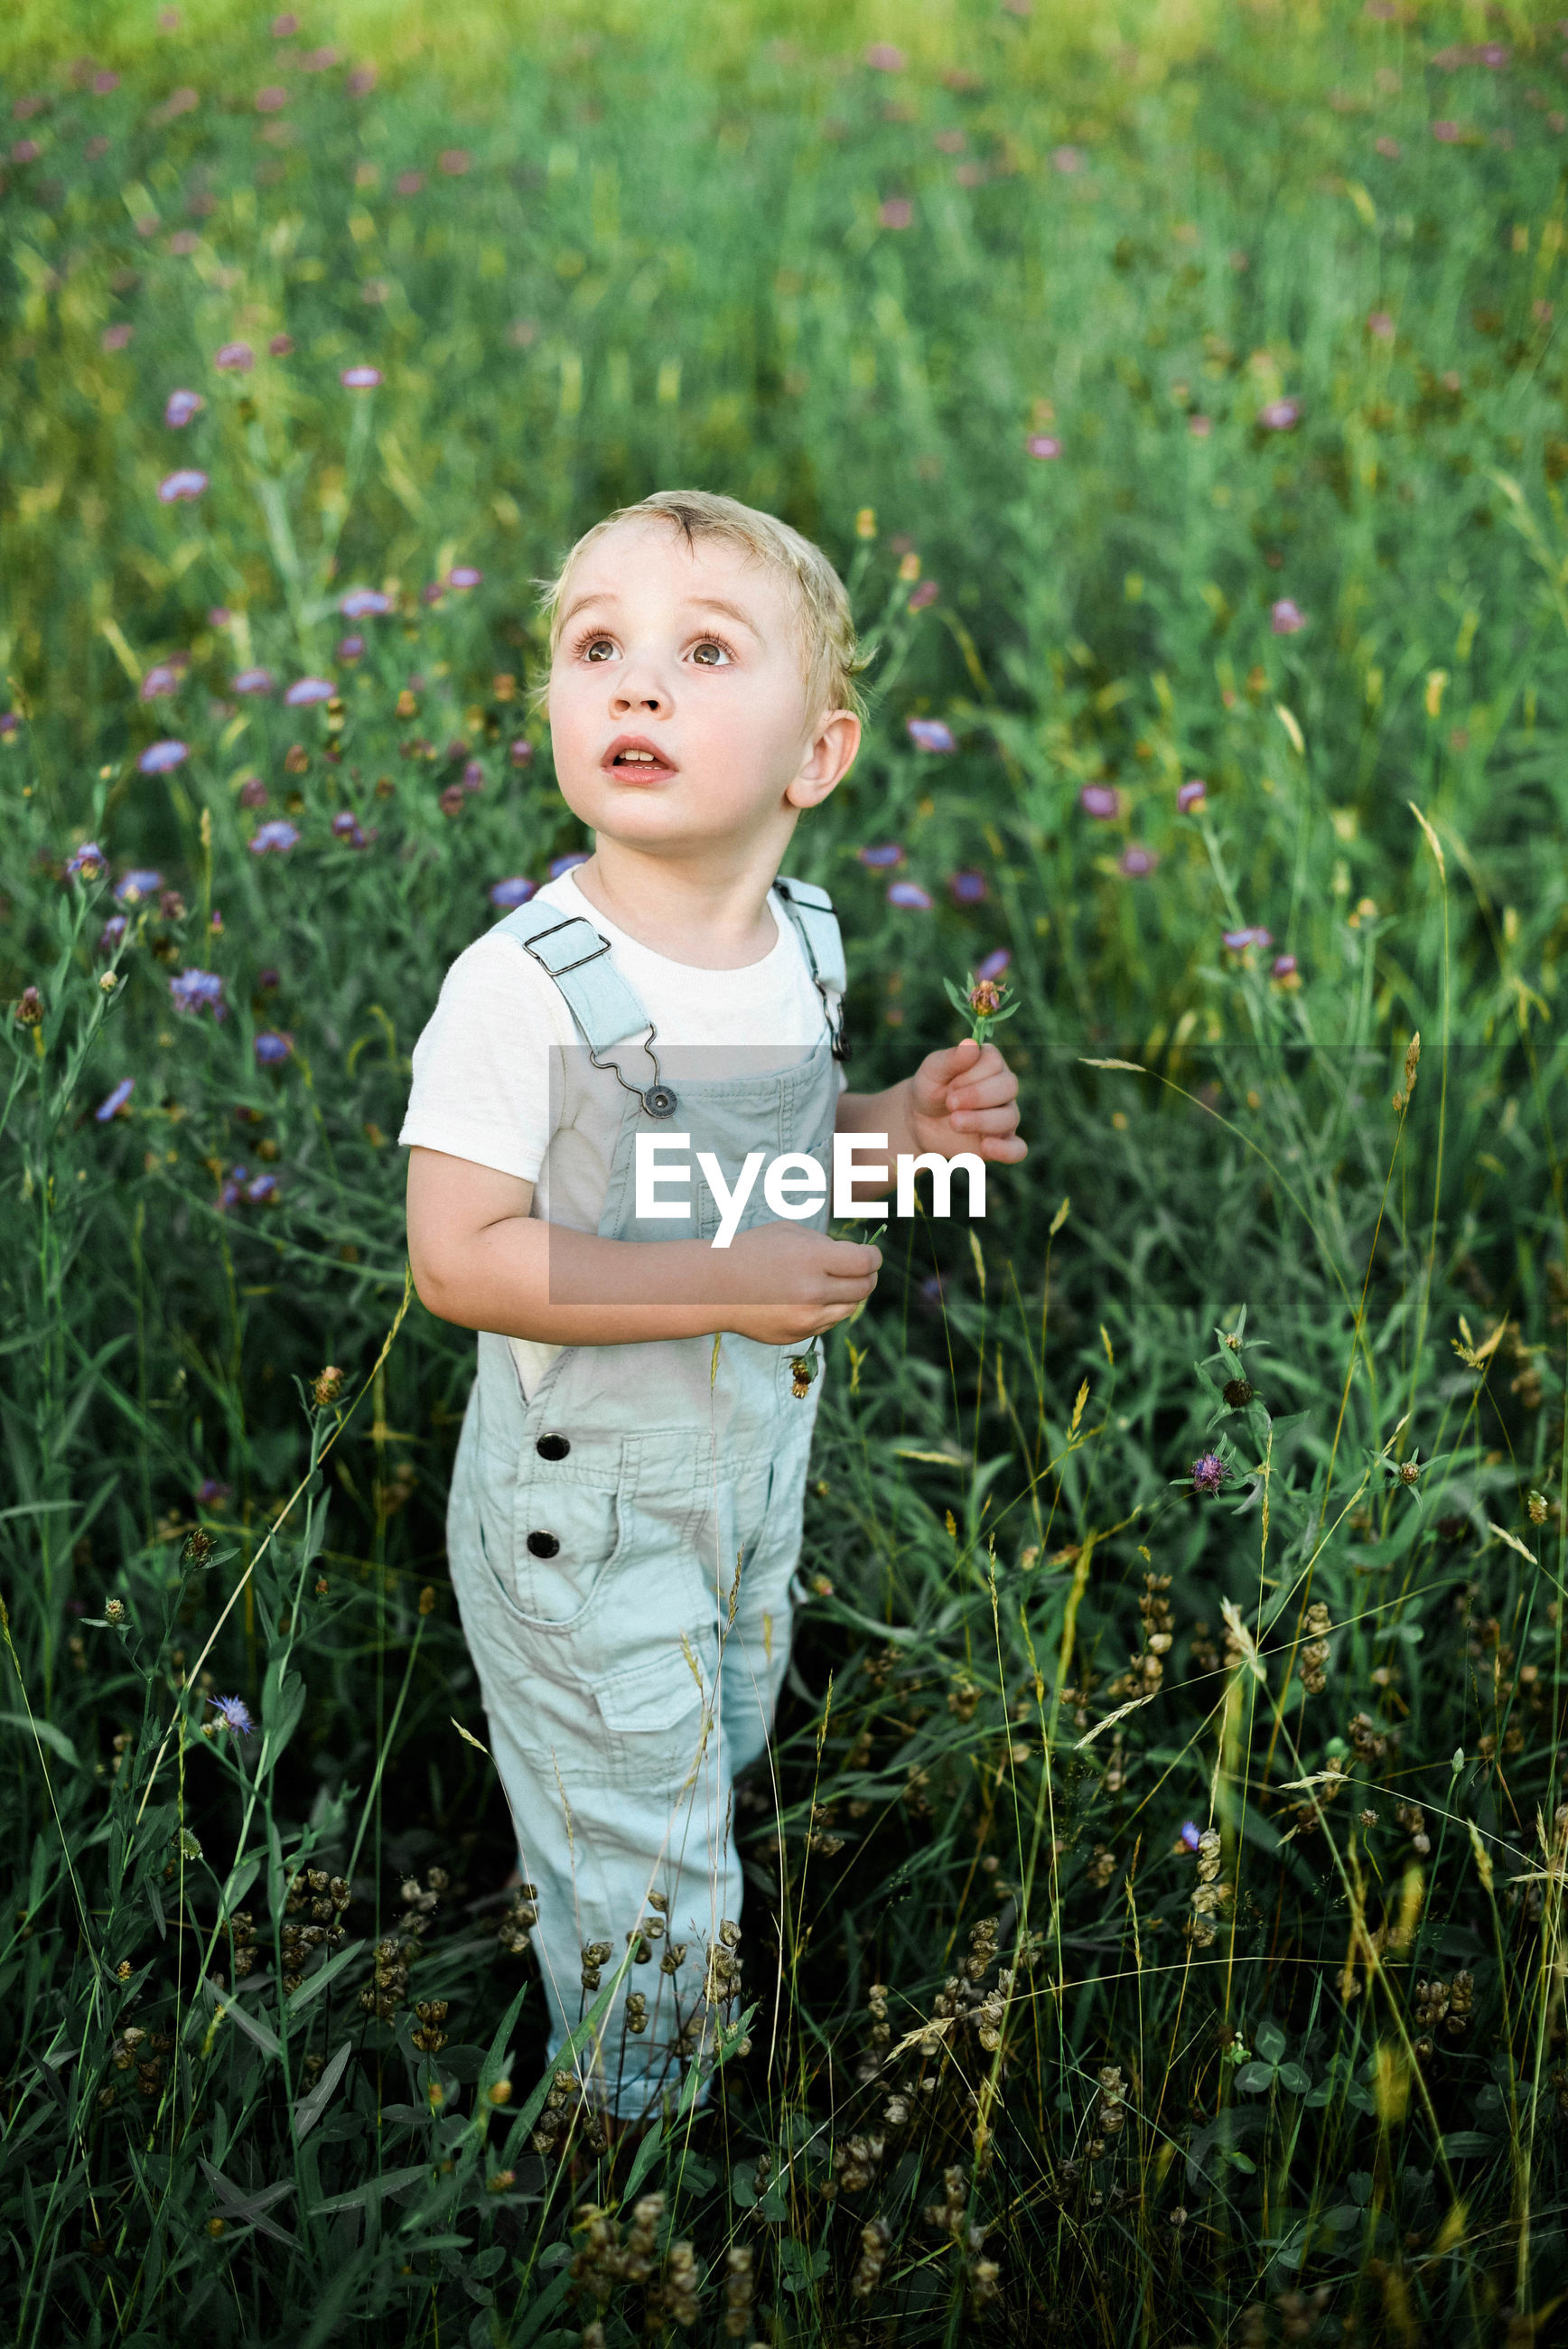 FULL LENGTH OF CUTE BOY ON GRASS